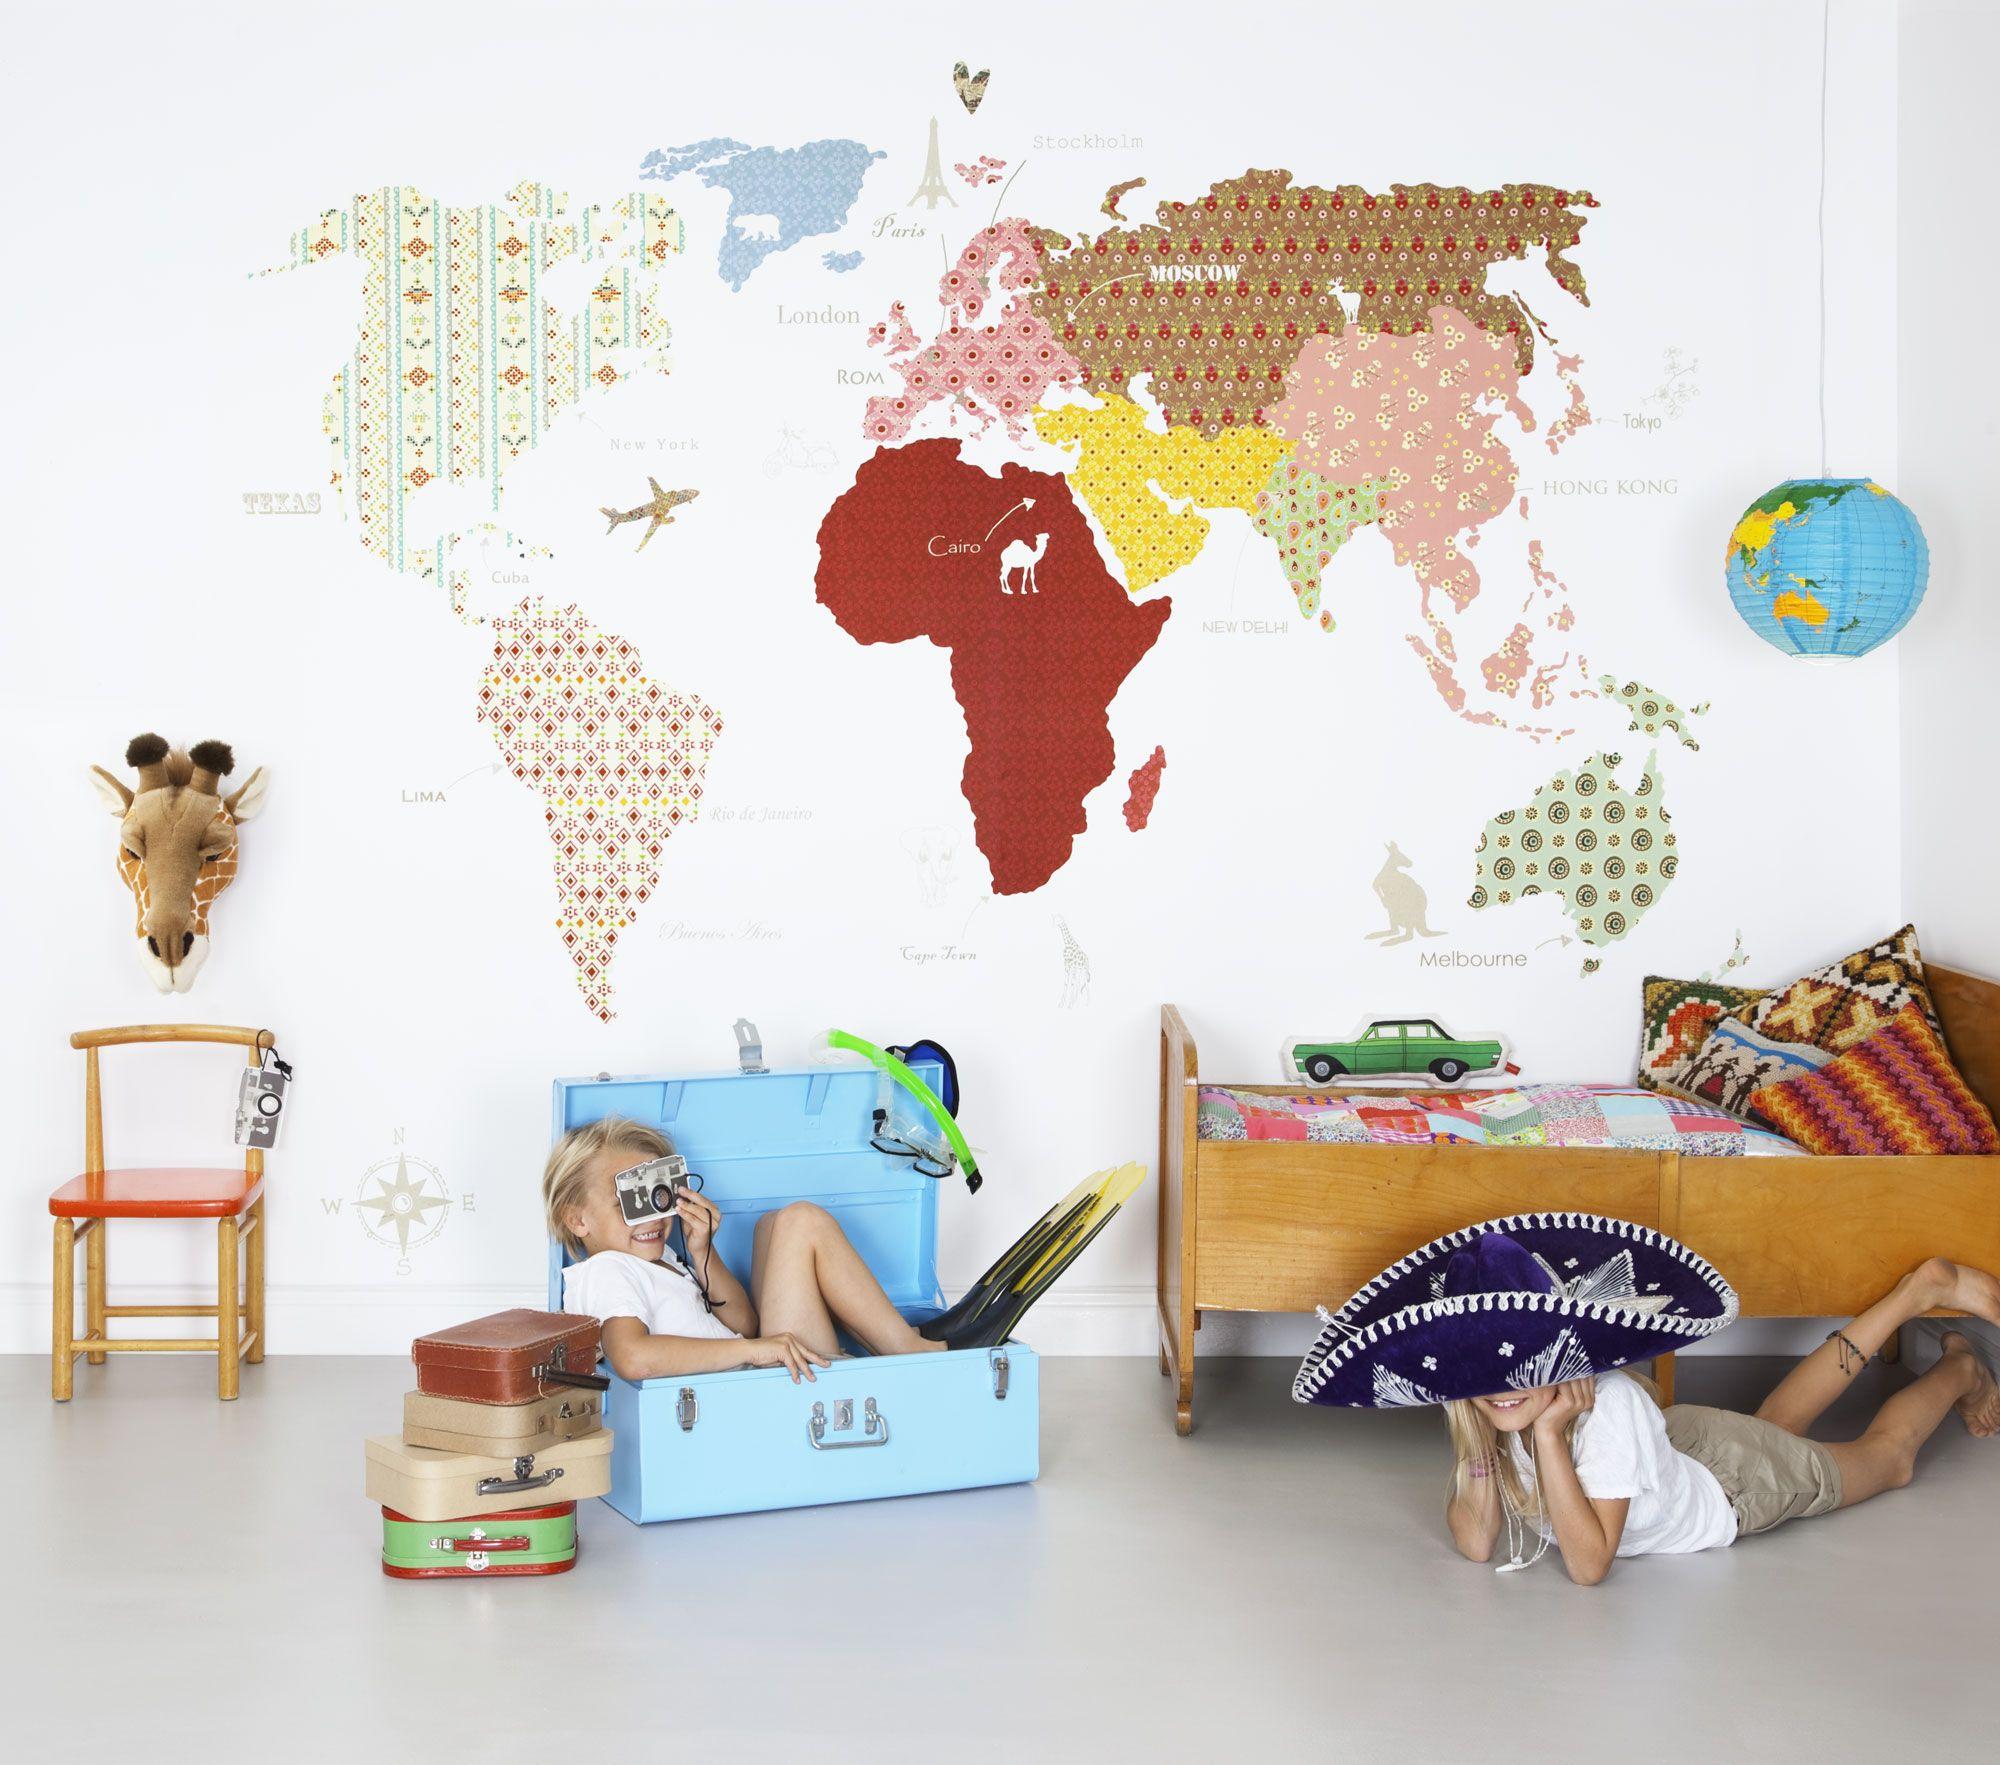 Whole wide world wall map patterned world map style for the child whole wide world wall map patterned world map gumiabroncs Choice Image